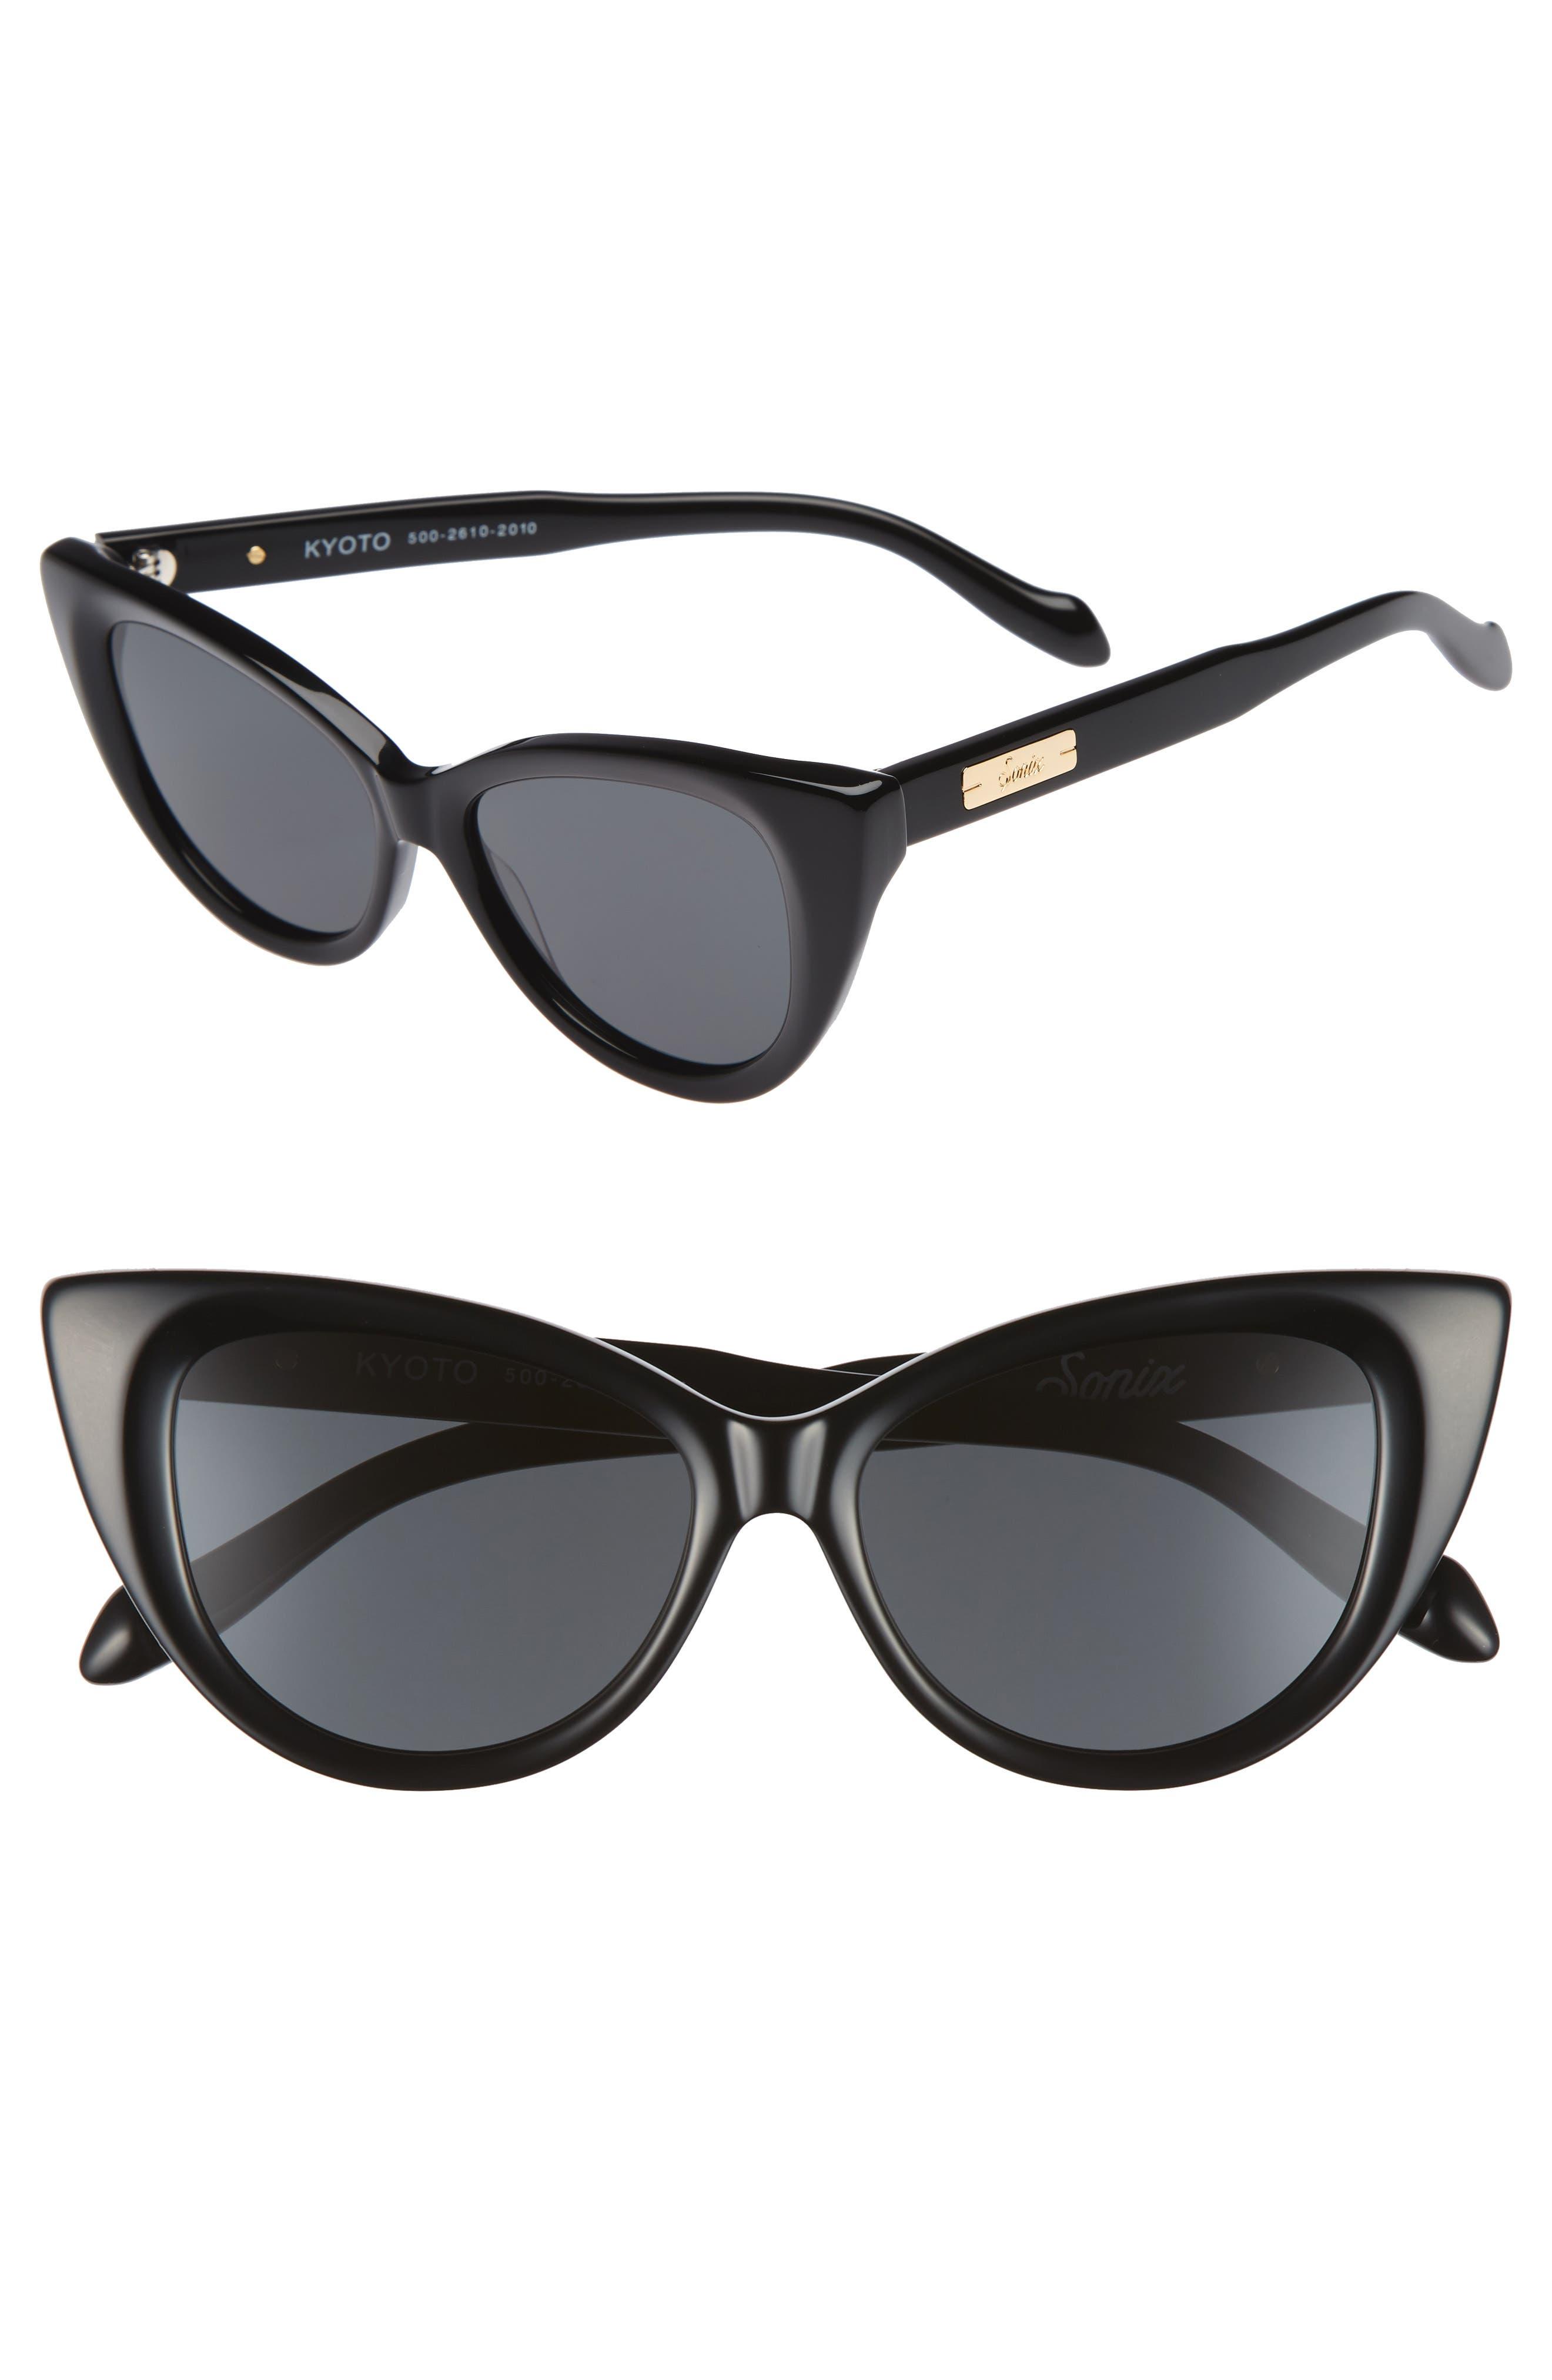 Main Image - Sonix Kyoto 51mm Cat Eye Sunglasses